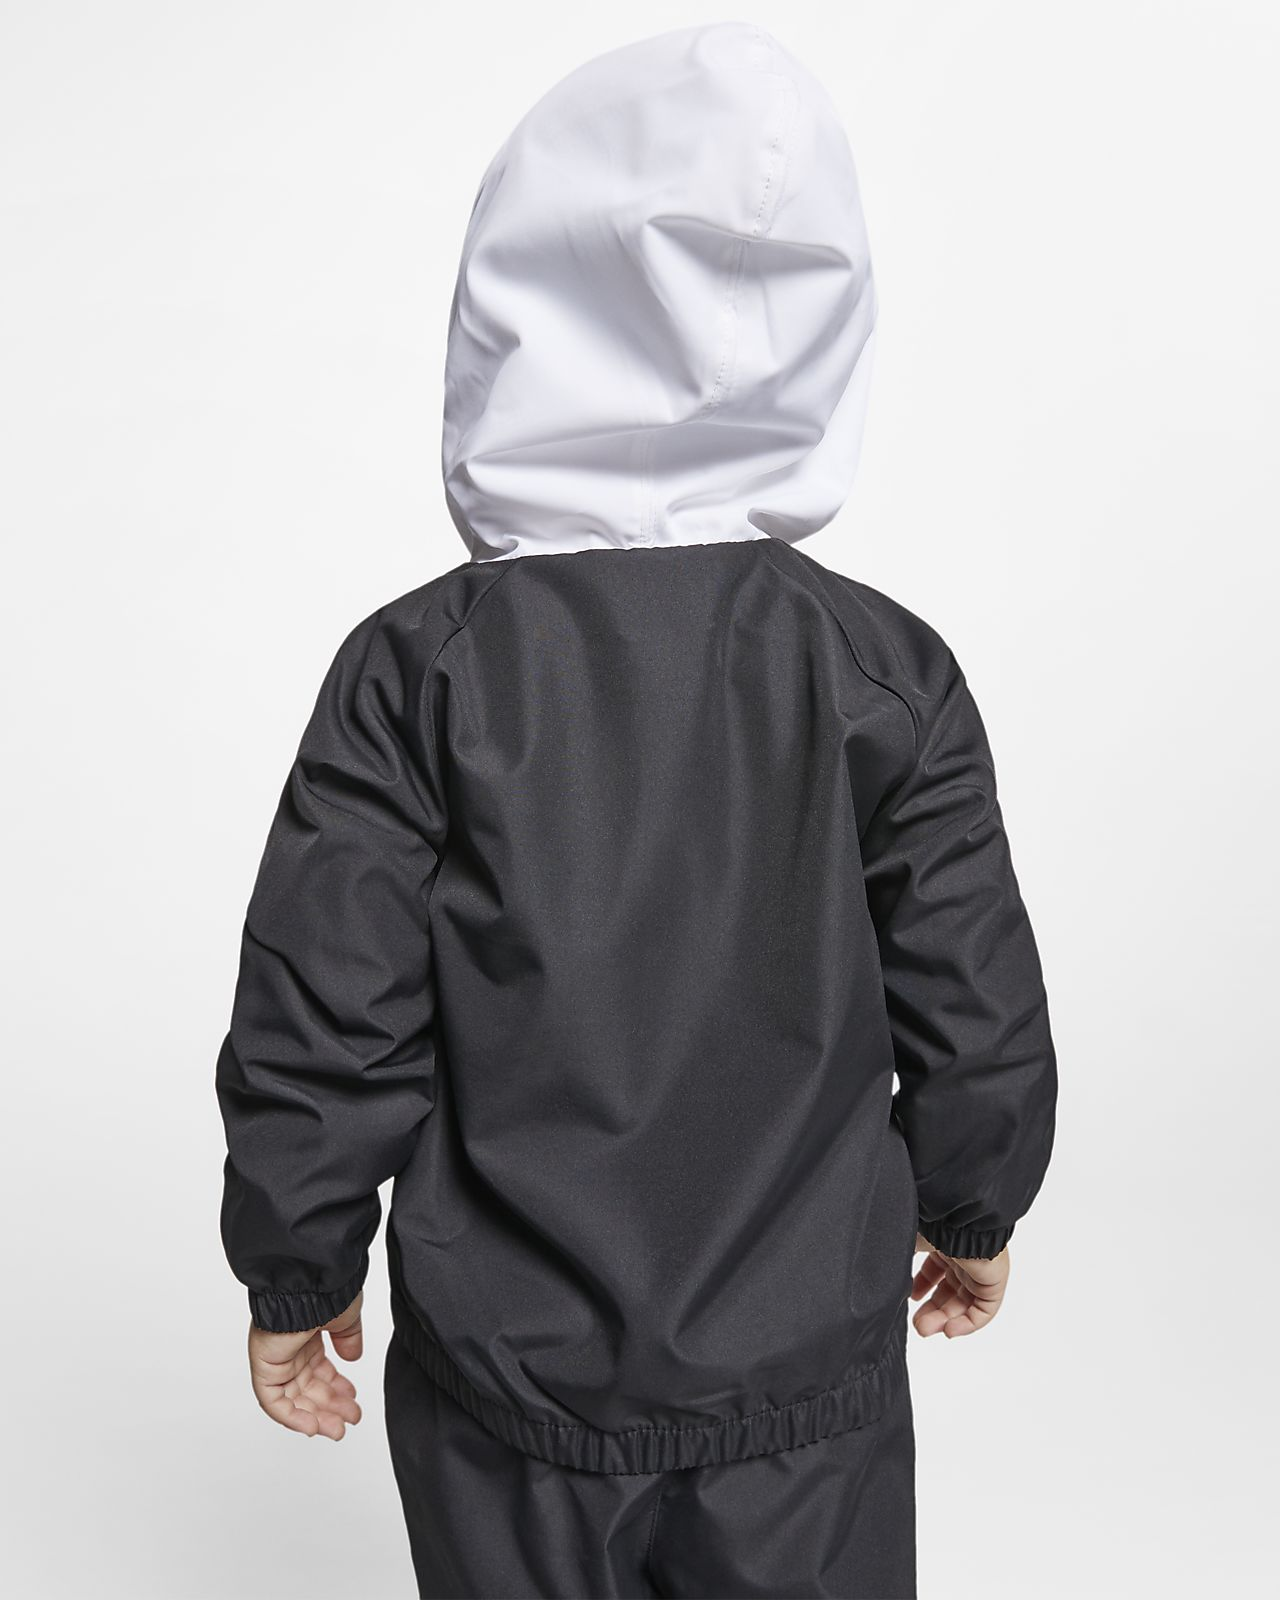 5e84020f3f5d8 Nike Sportswear Windrunner Baby (12-24M) 2-Piece Set. Nike.com